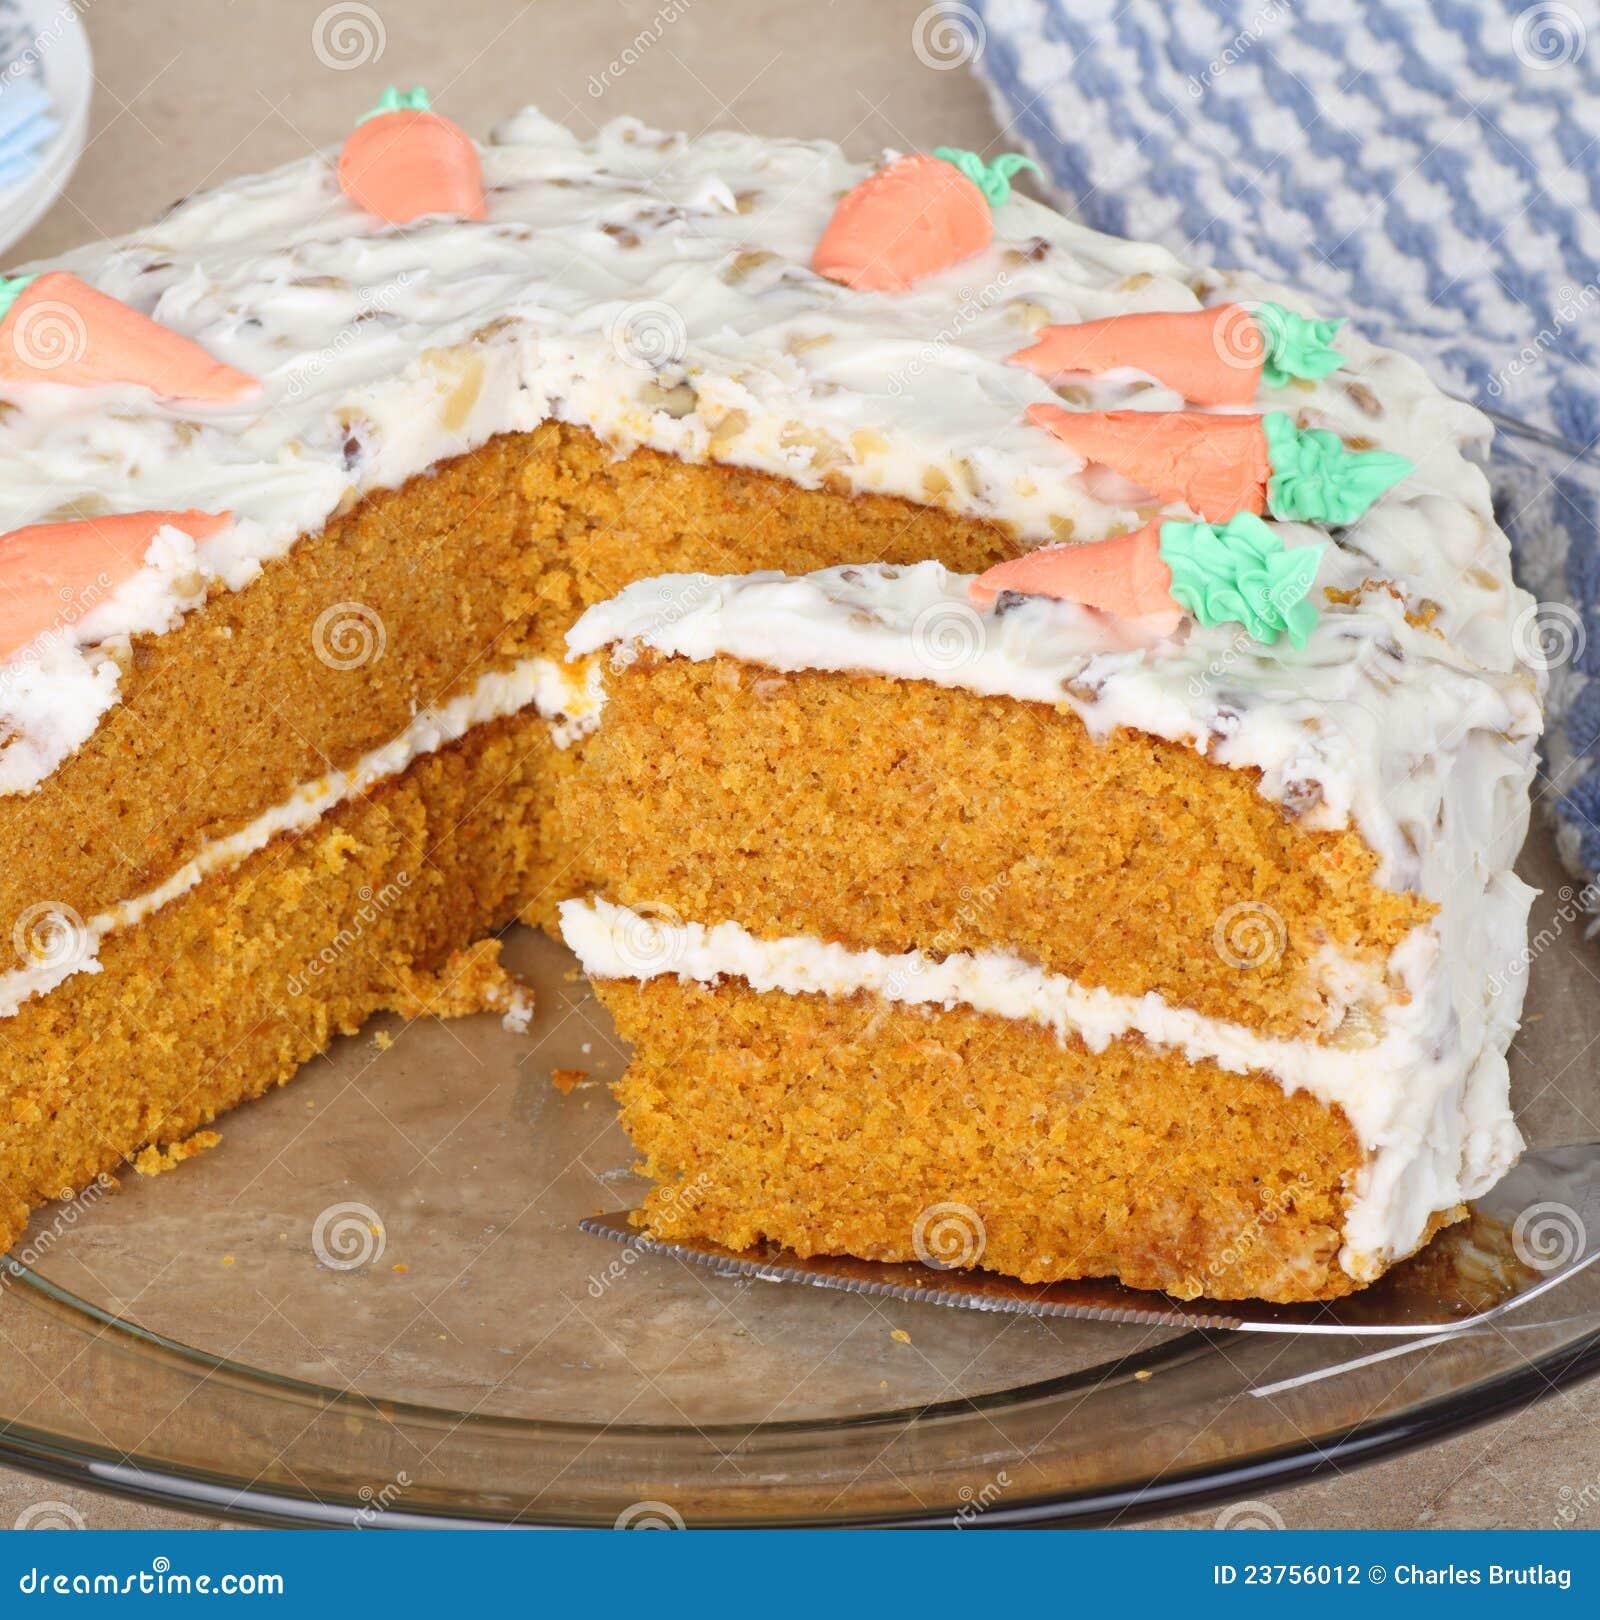 Carrot Layer Cake Slice